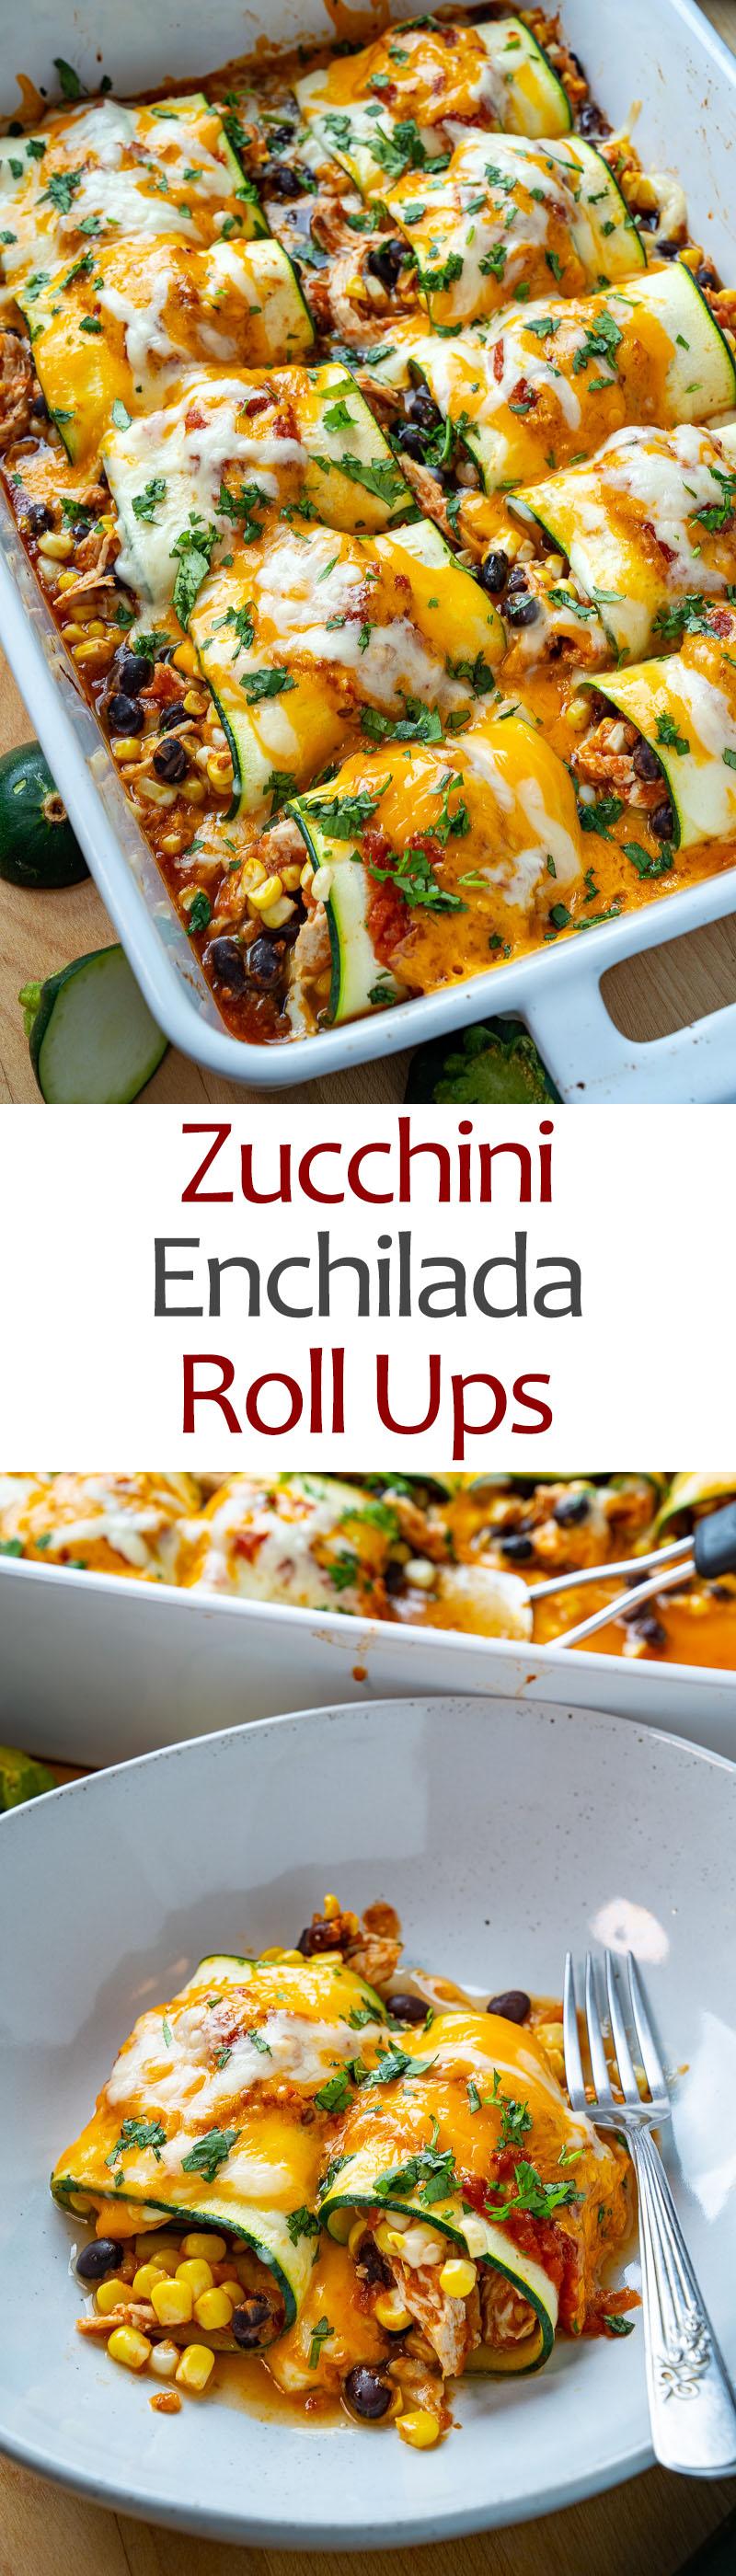 Zucchini Enchilada Roll Ups